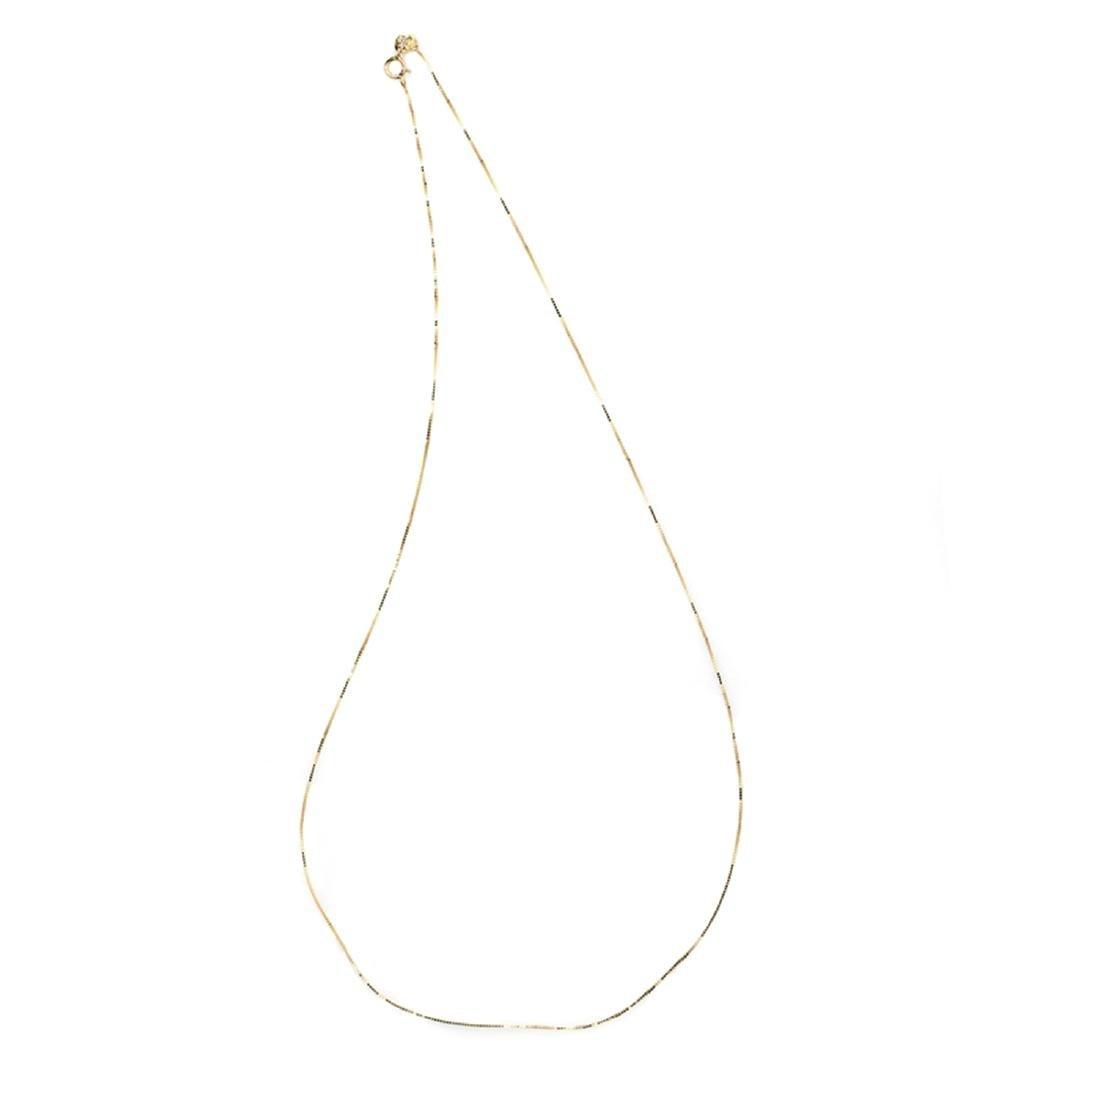 *Fine Jewelry 14 KT Gold, 1.0GM, 18'' Chain (GL Neck